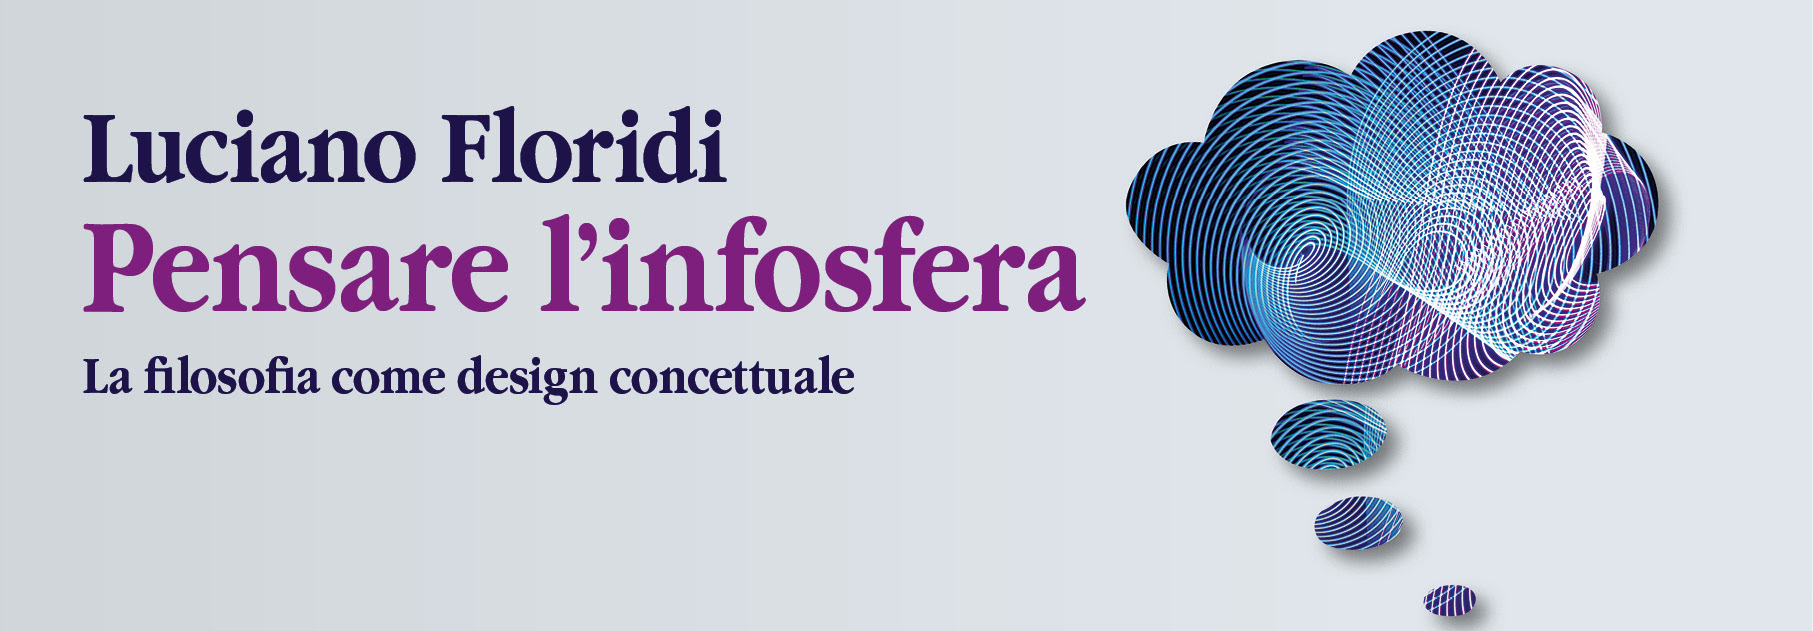 Luciano Floridi - Pensare l'infosfera